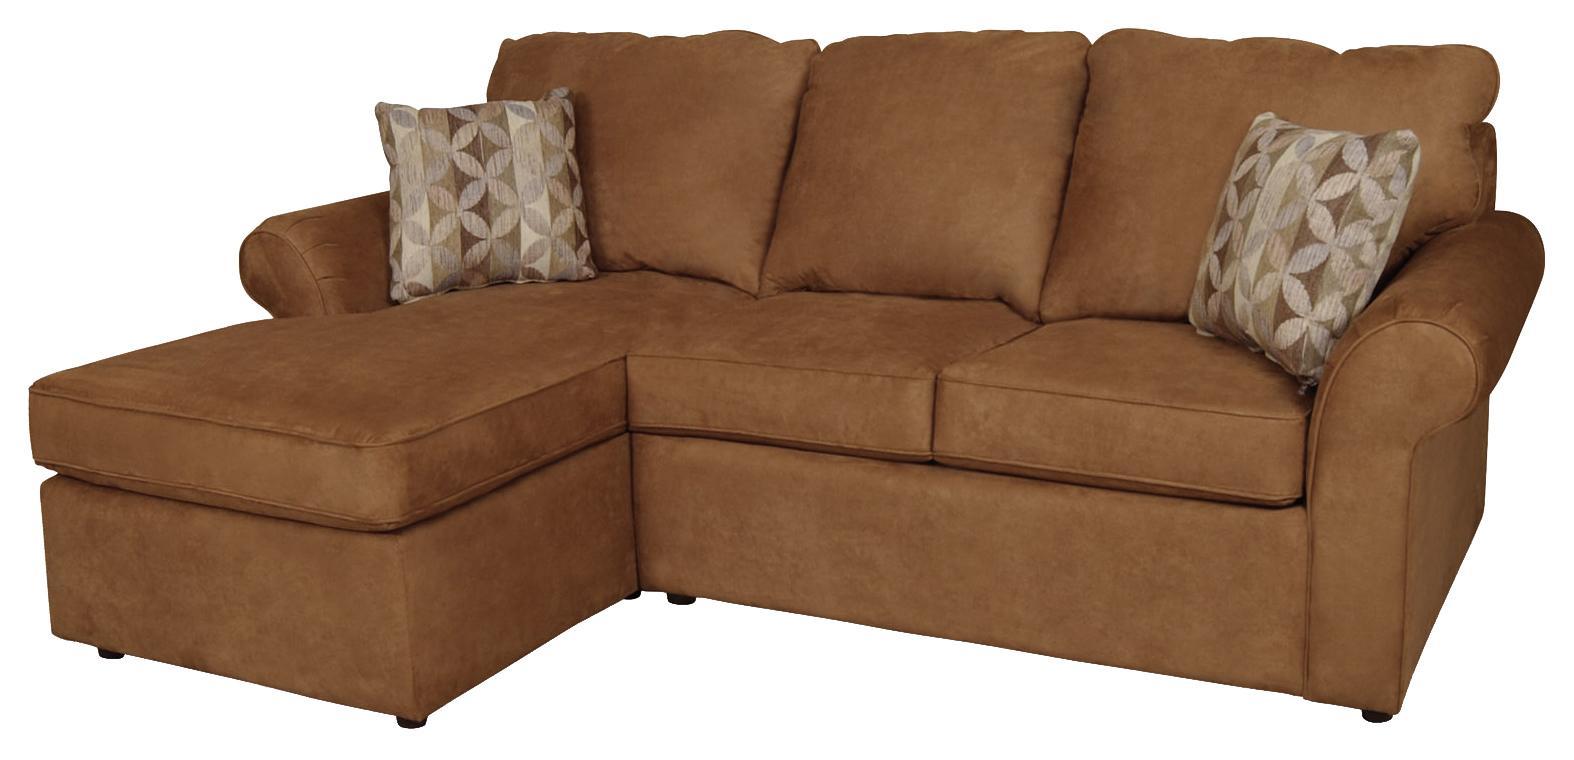 England malibu 3 seat left side chaise sofa dunk for England furniture sectional sofa